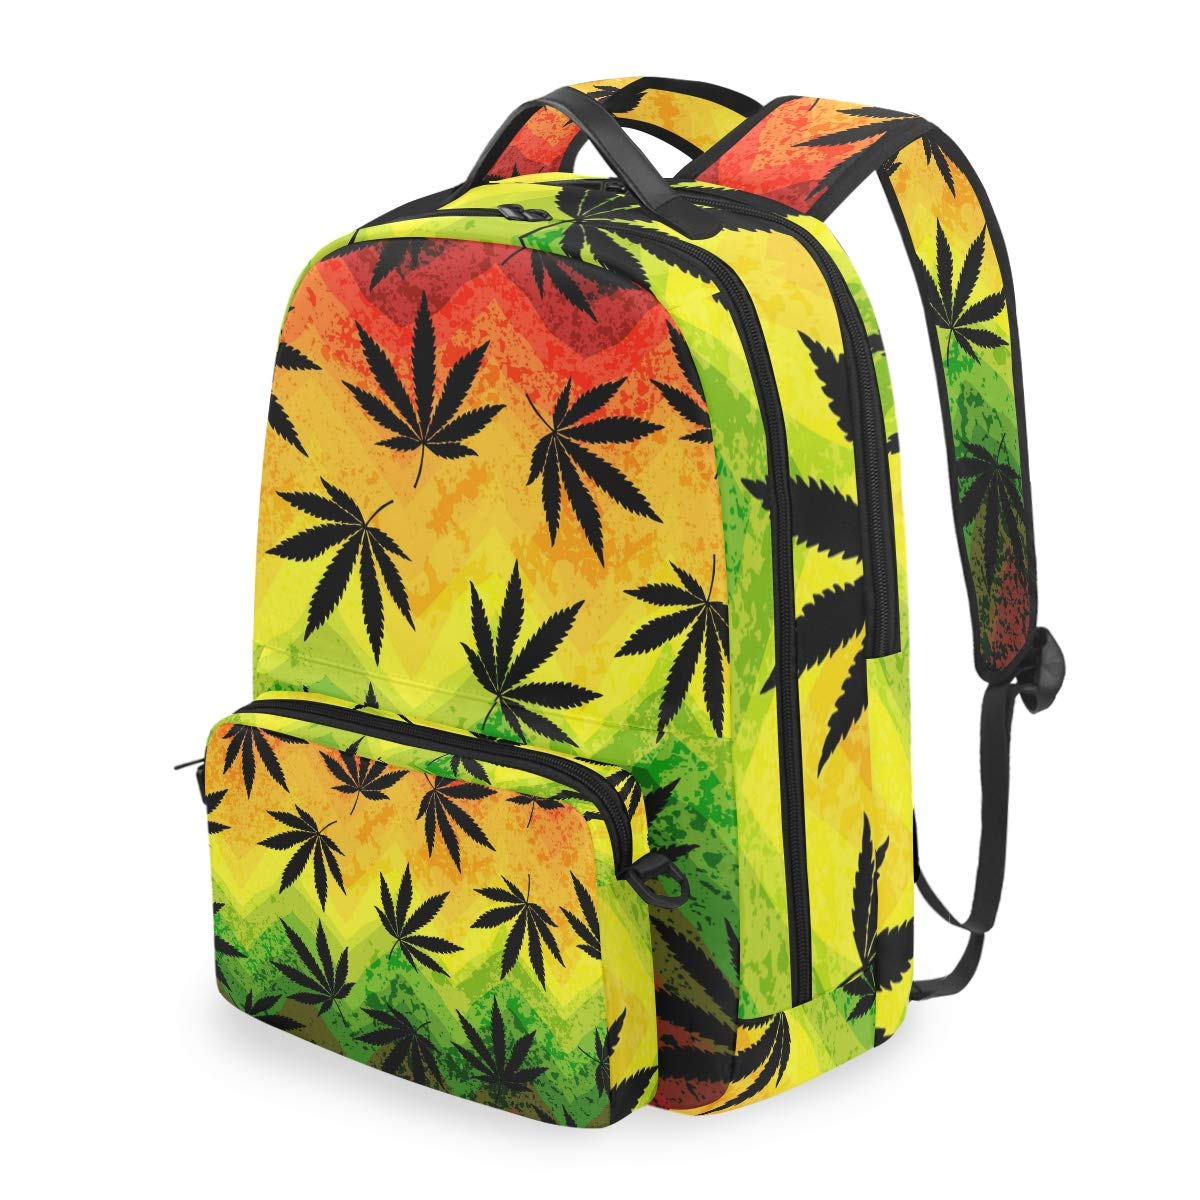 MAHU Backpack Marijuana Hemp Leaves Detachable College Bag Travel Zipper Bookbag Hiking Shoulder Crossbody Bag Daypack for Women Men